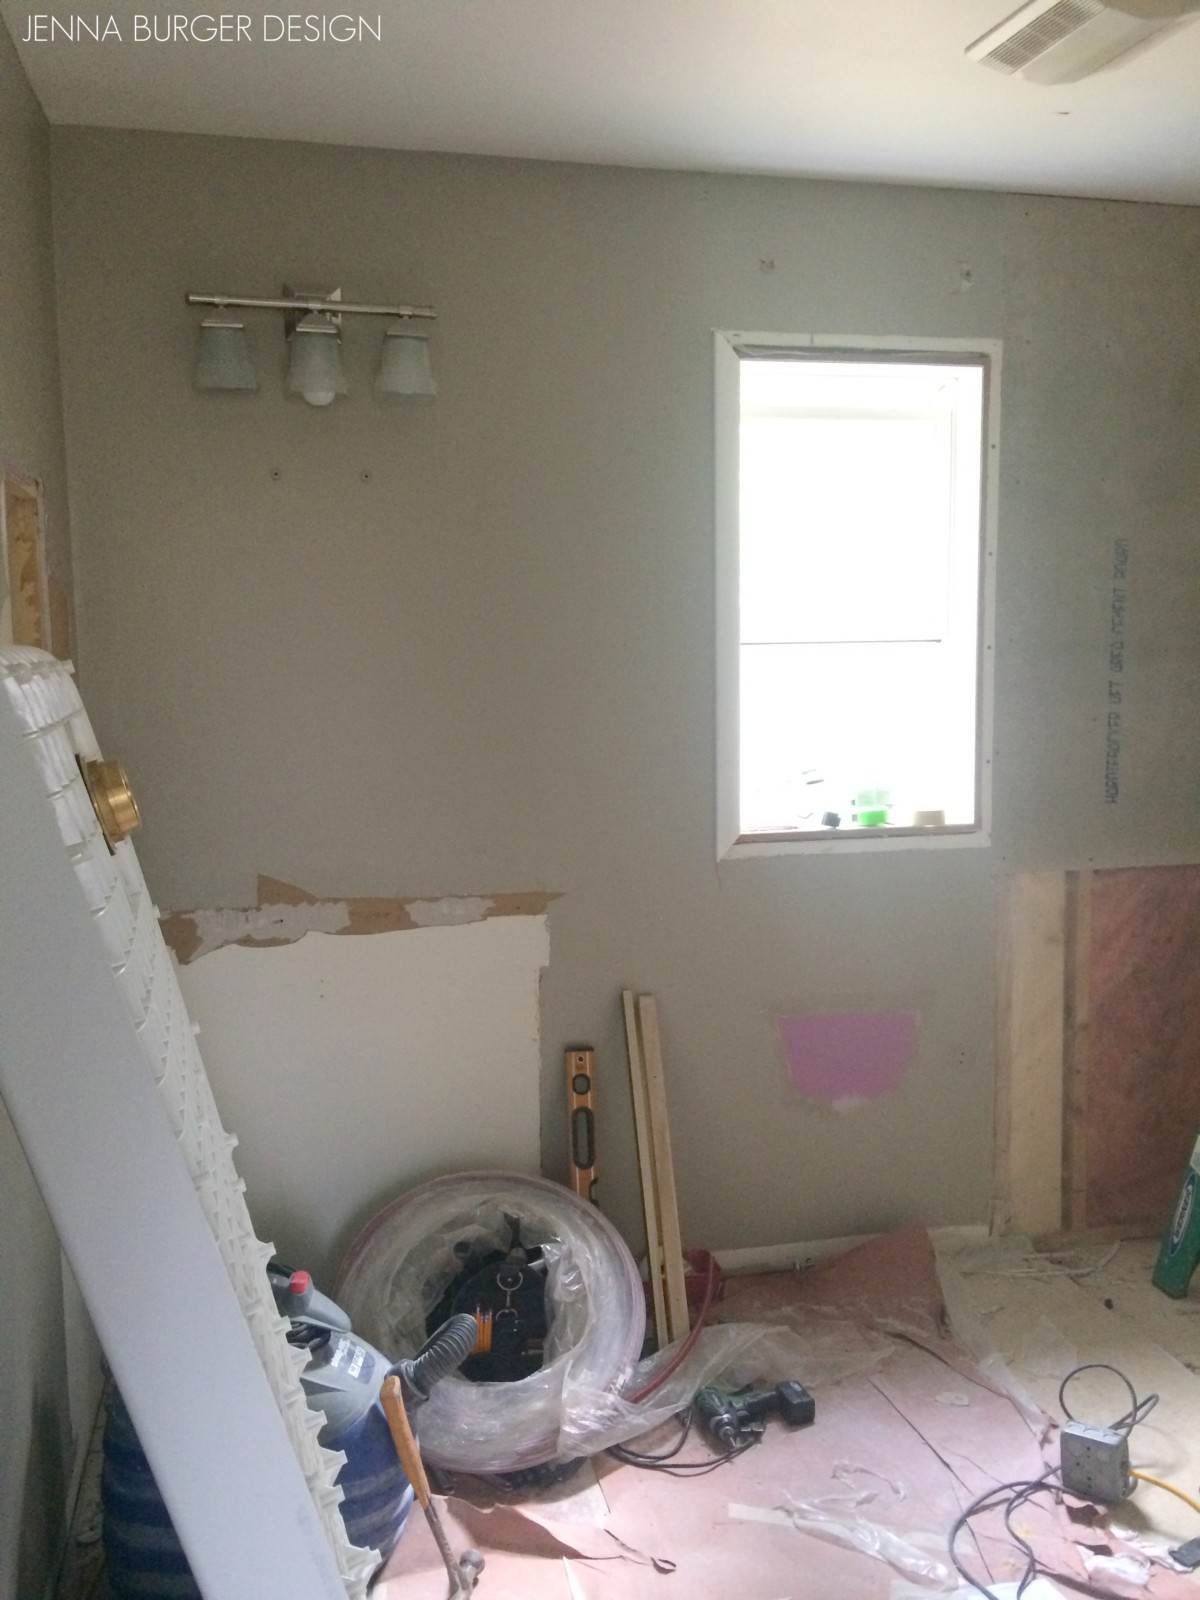 Master bathroom renovation demo jenna burger for How to demo a bathroom